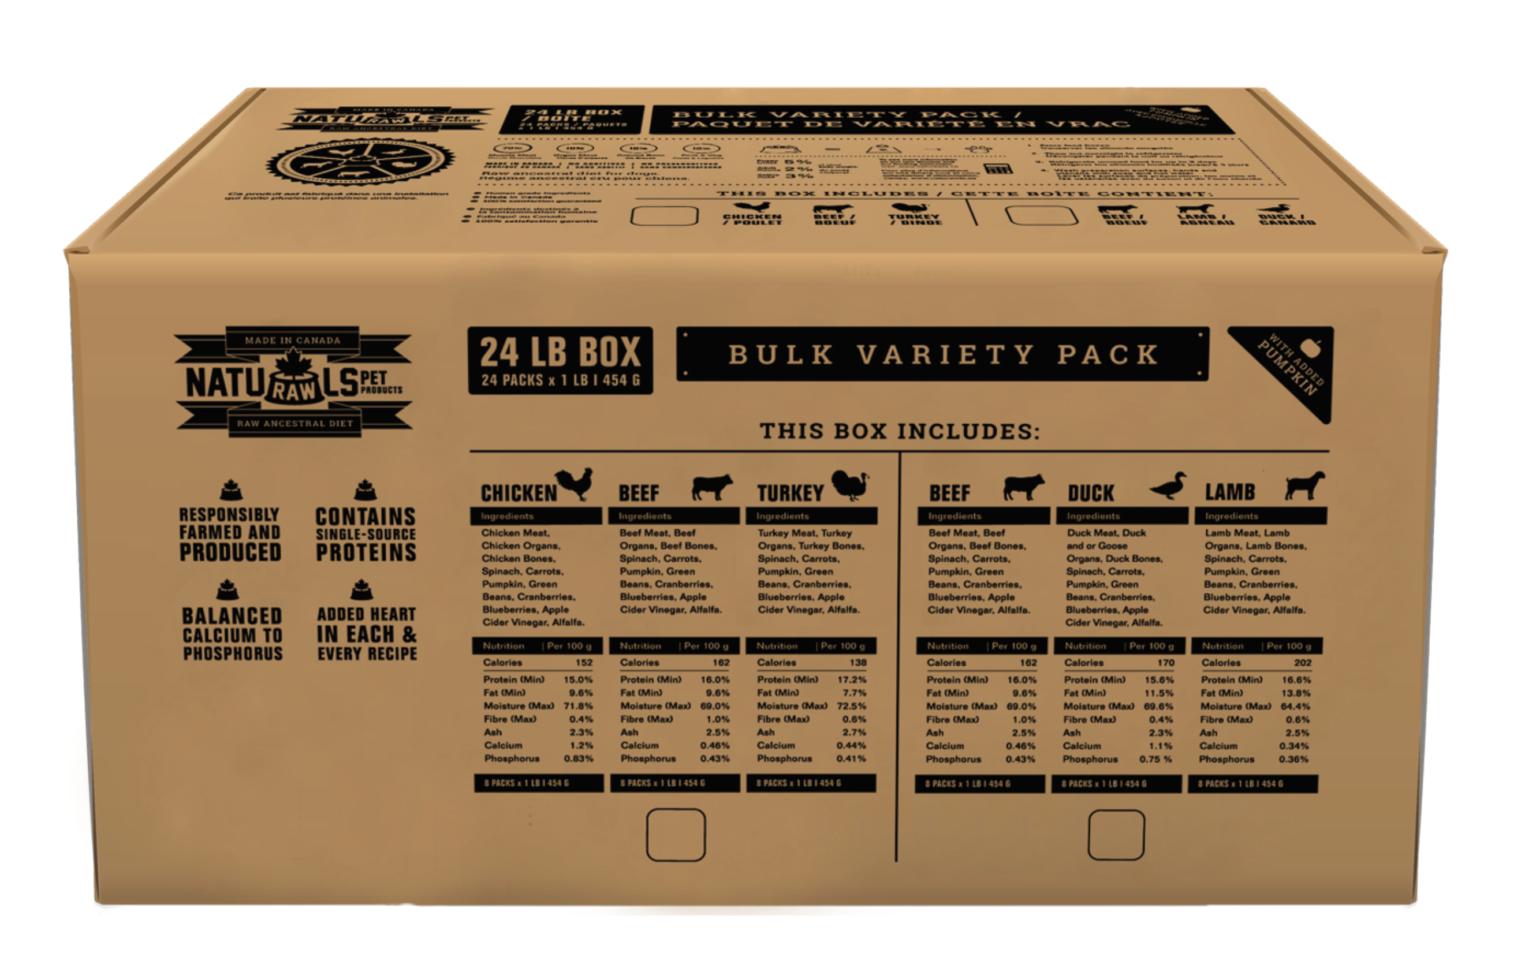 Variety Pack Beef Duck Lamb Bulk 21lb